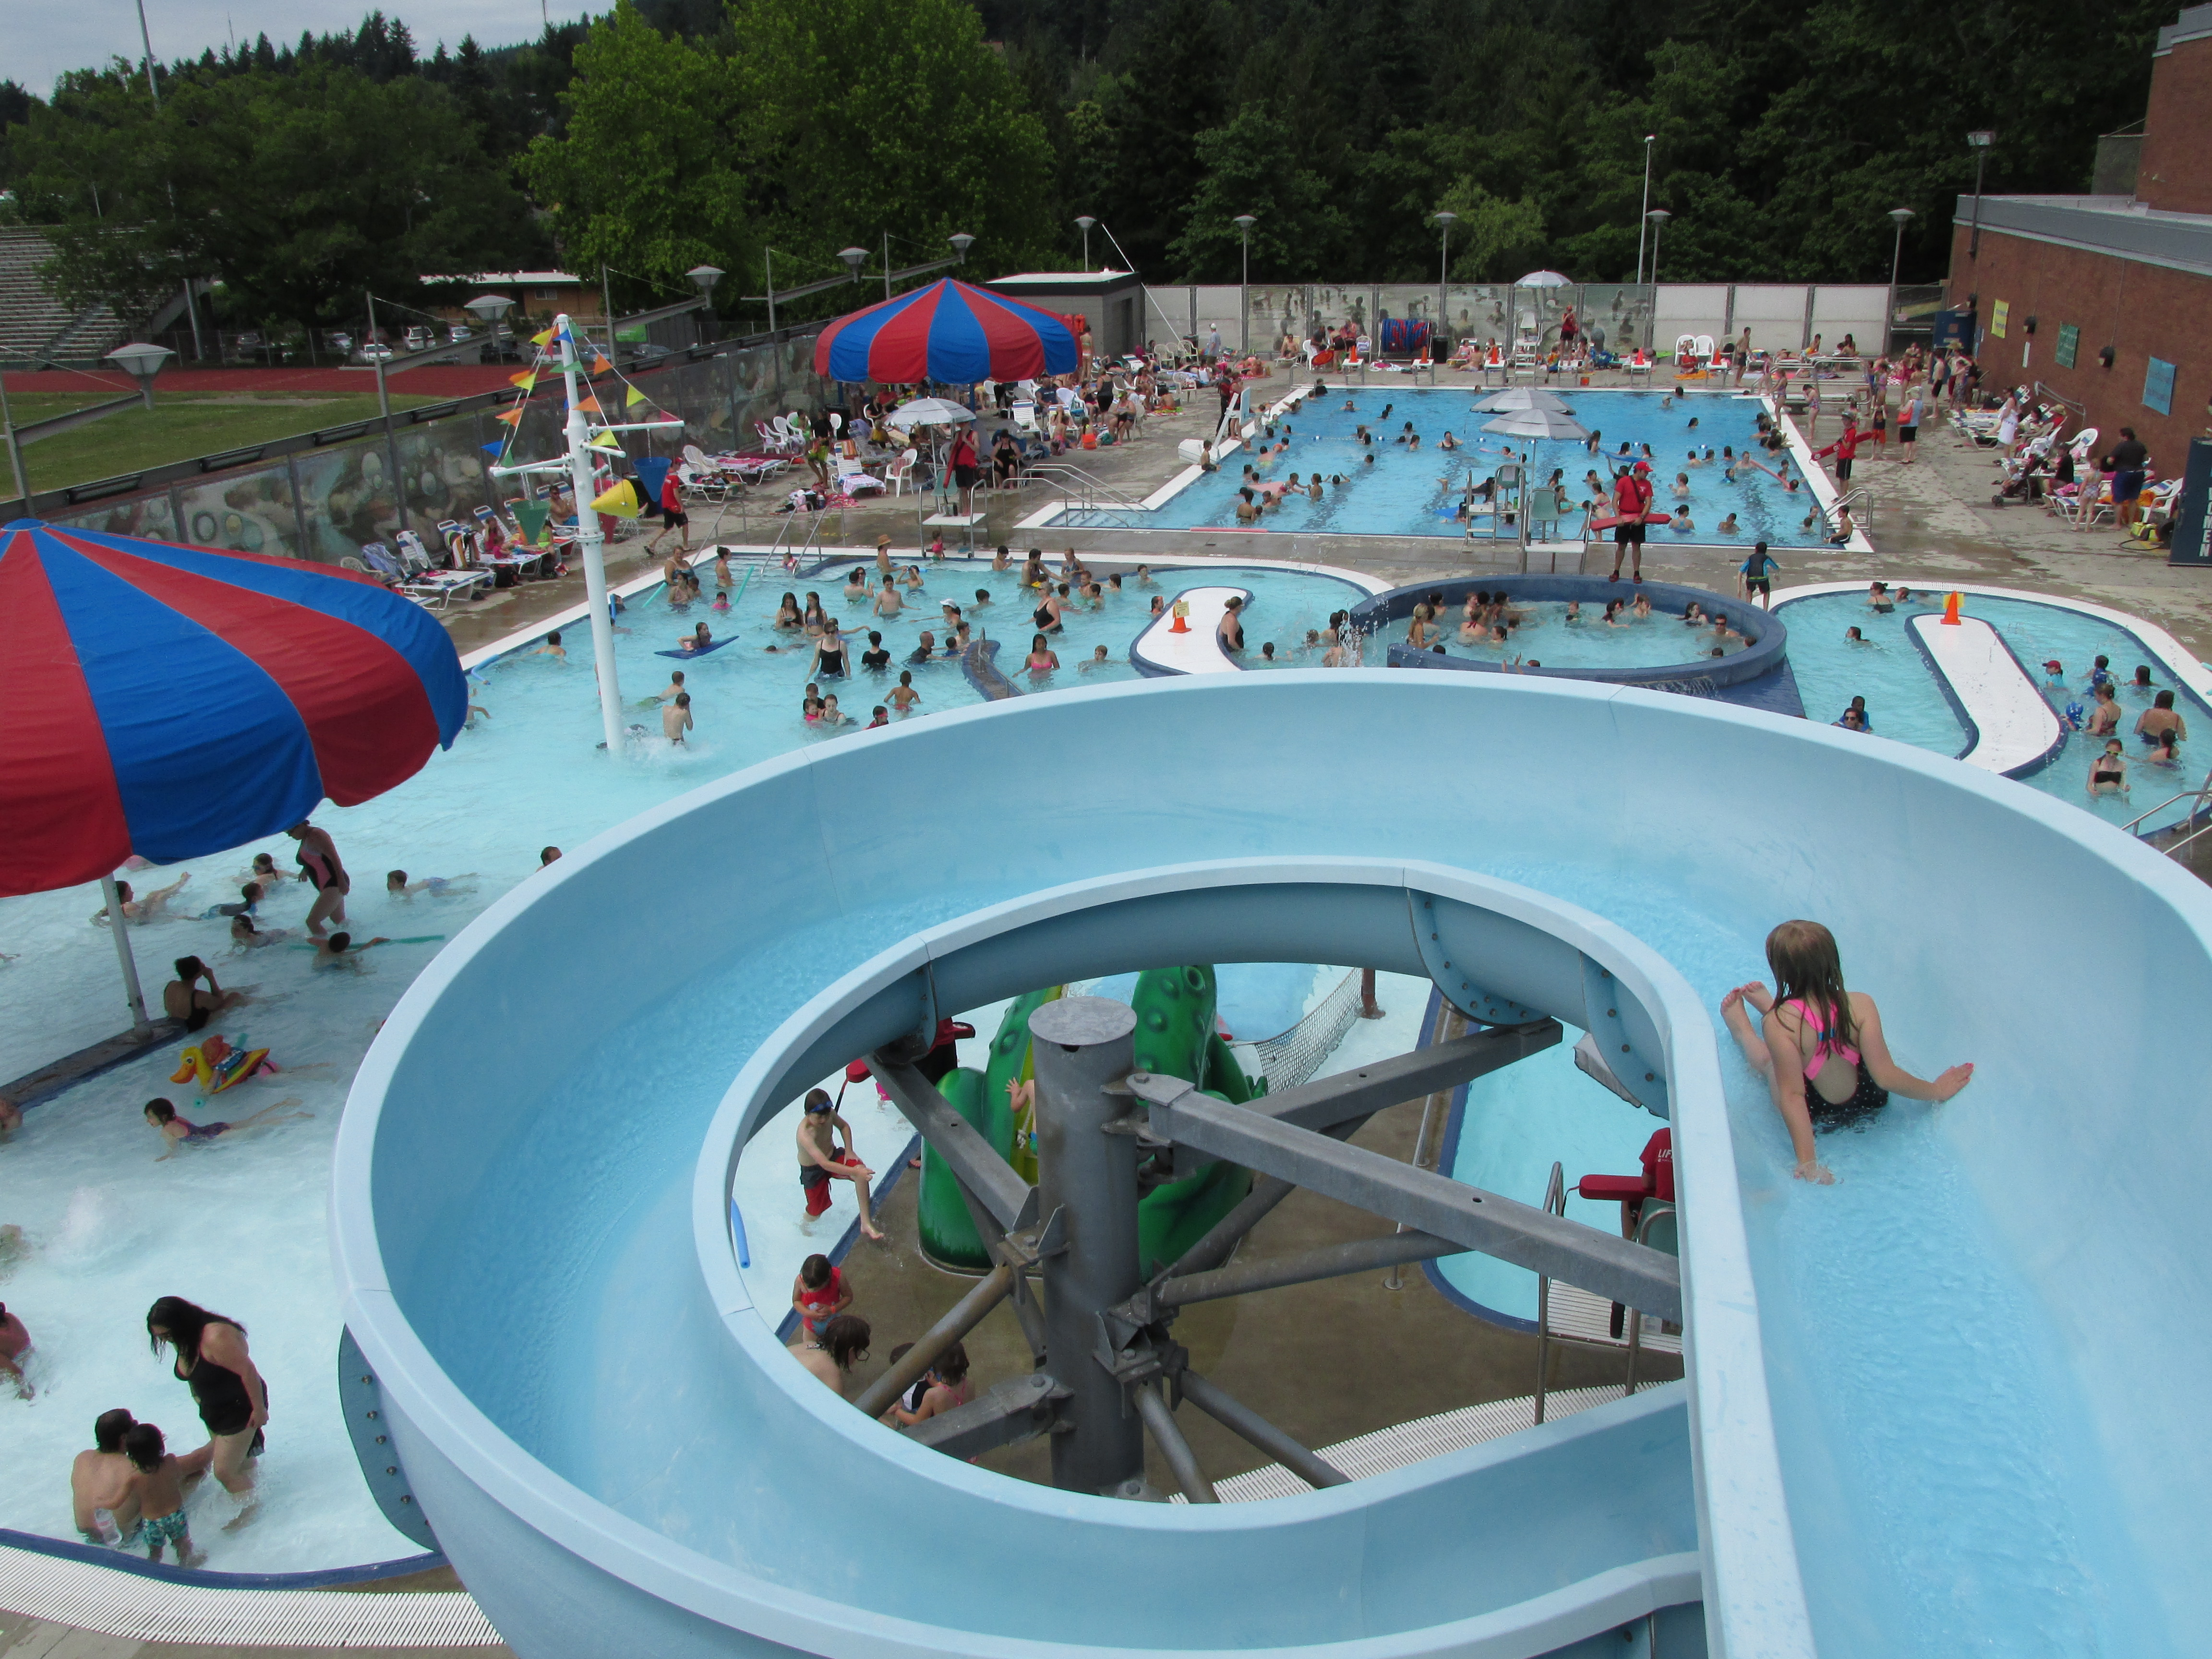 Portland public outdoor pools set to open June 18